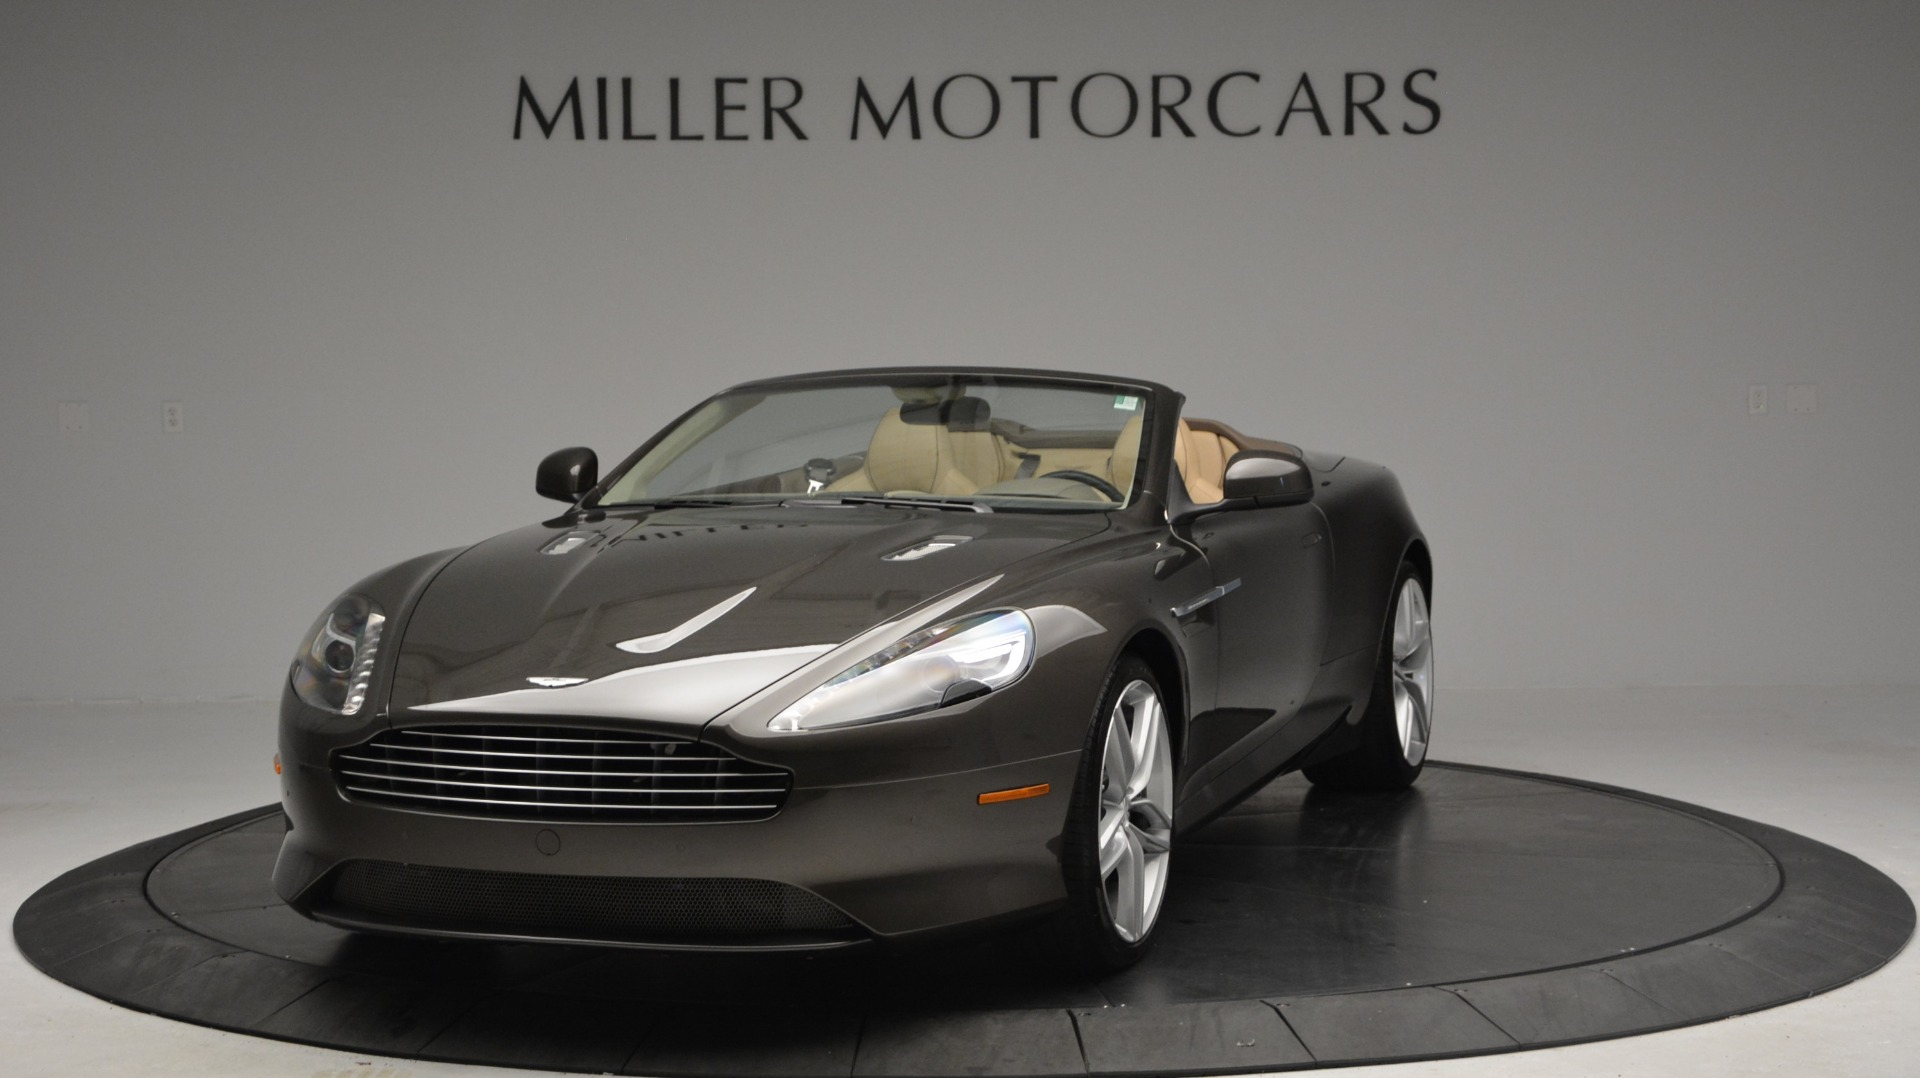 Used 2012 Aston Martin Virage Convertible For Sale In Greenwich, CT. Alfa Romeo of Greenwich, 7613 3351_p13